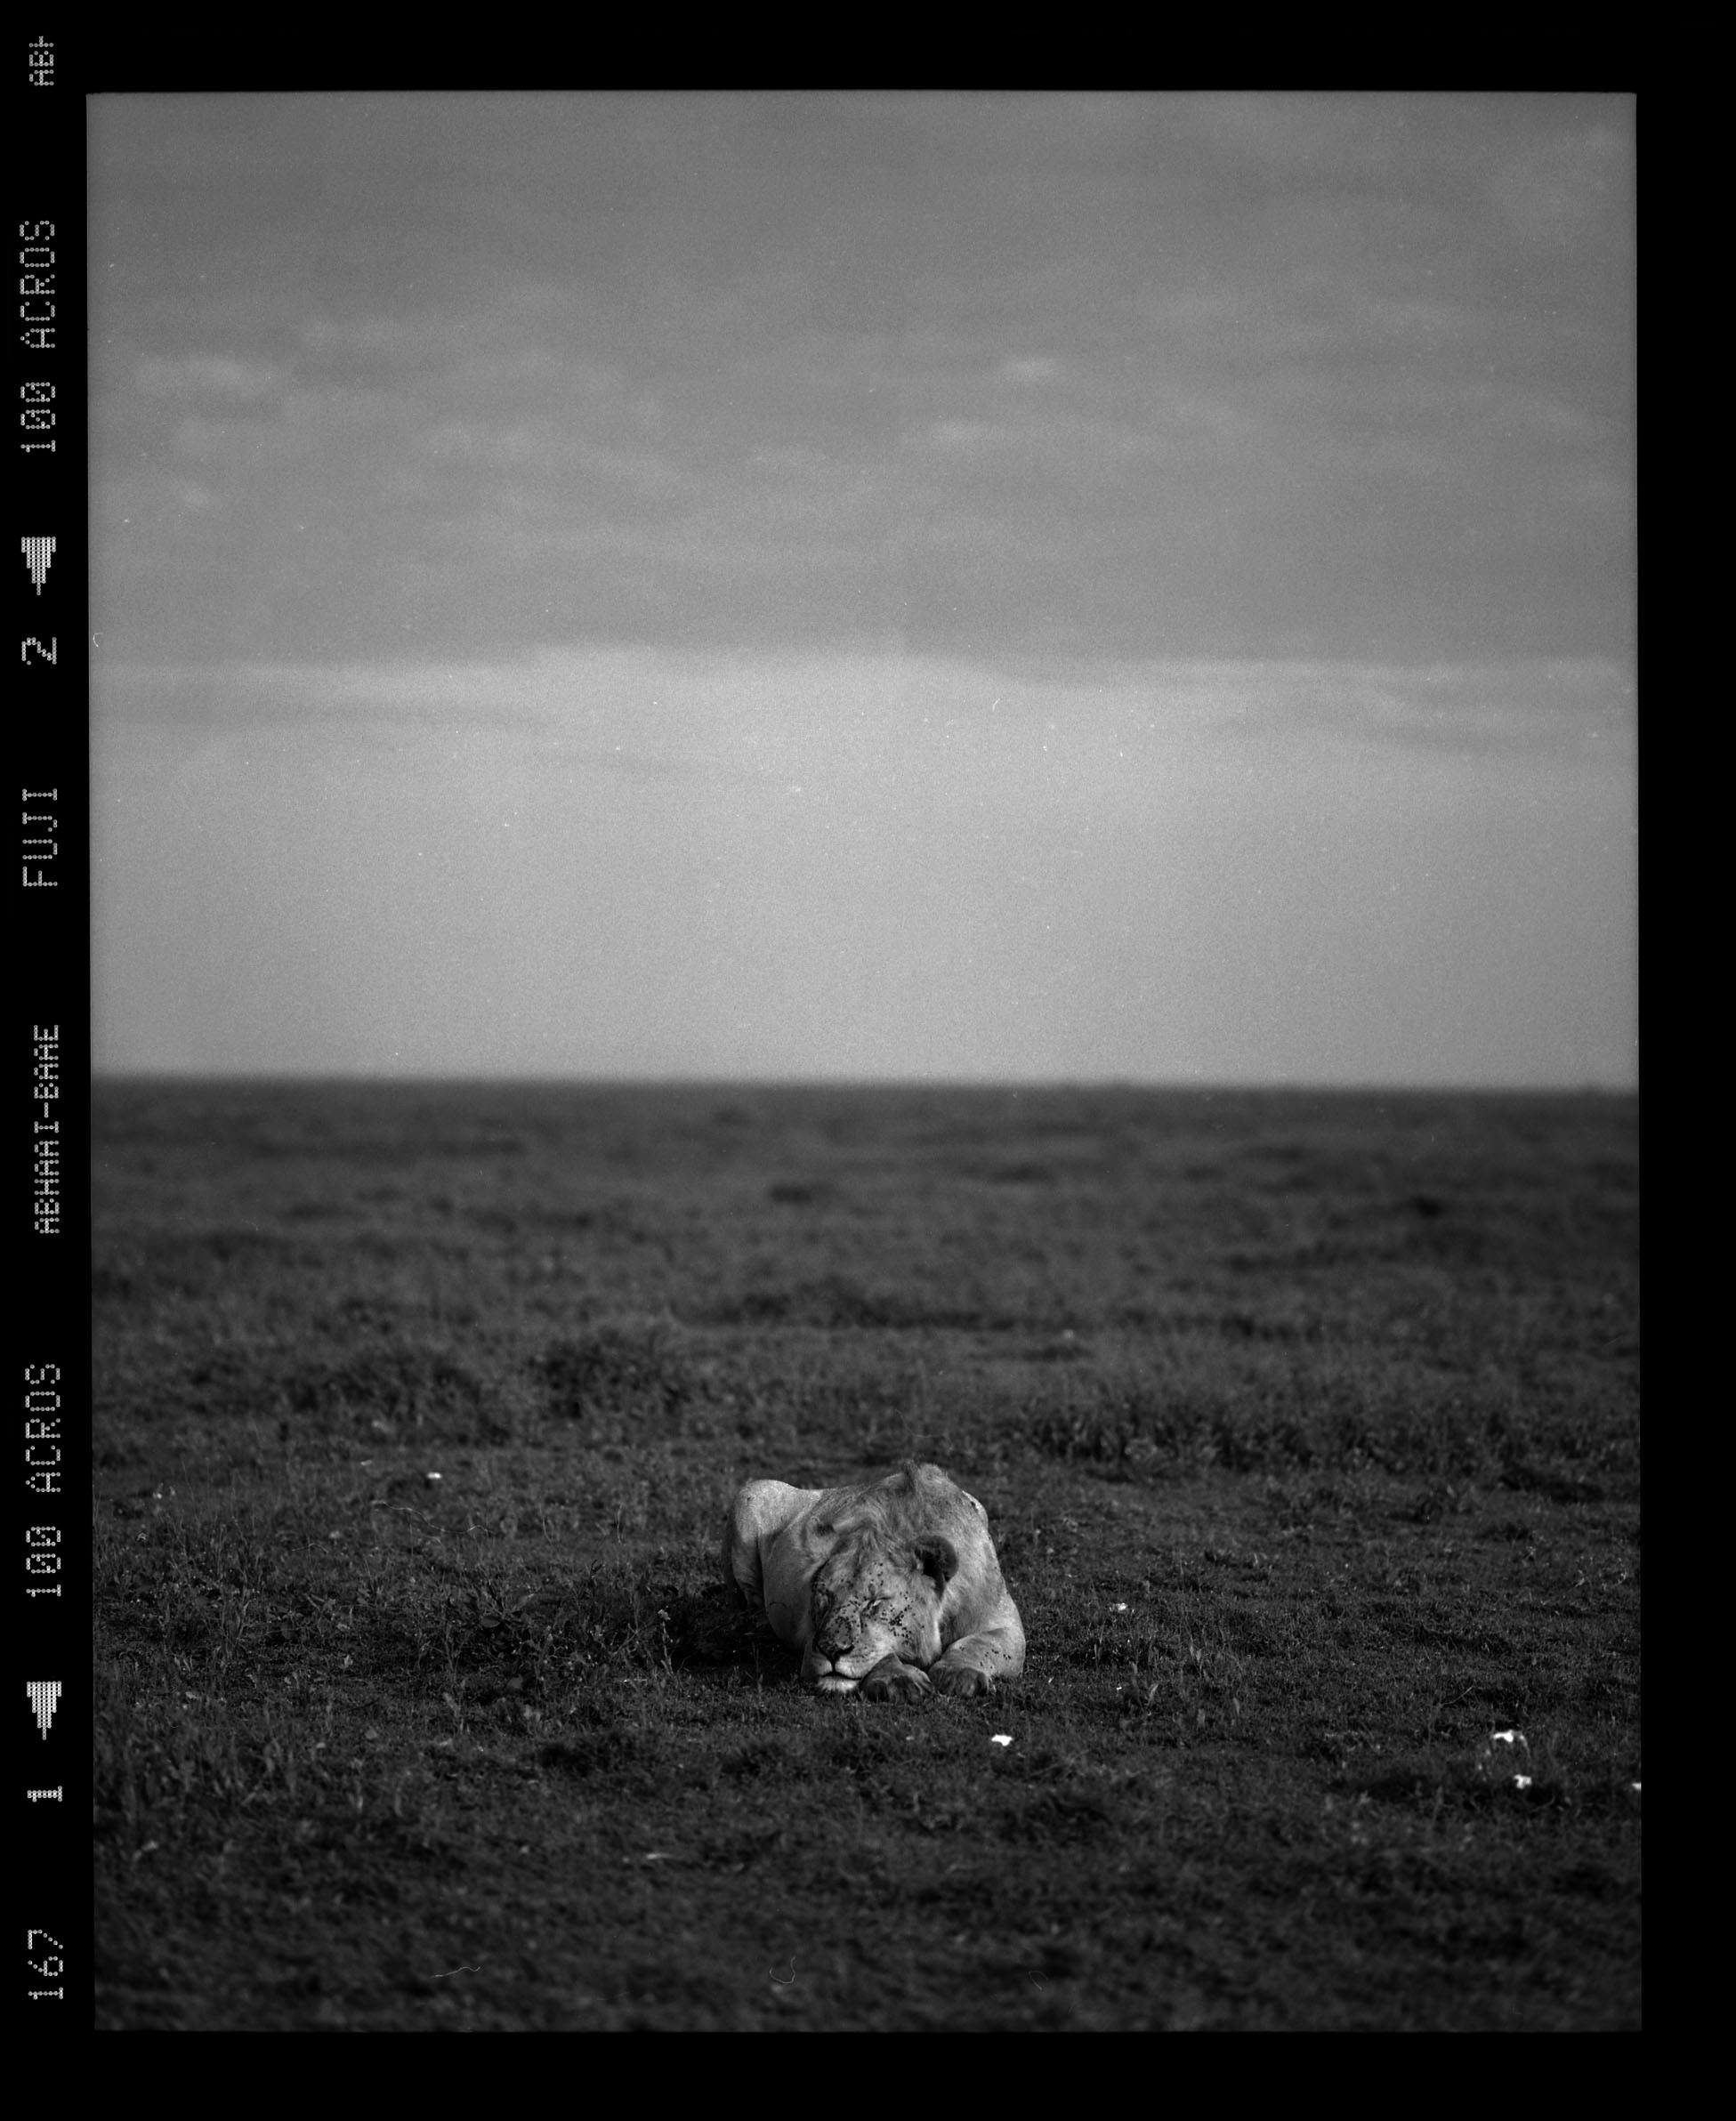 """Lion Sleeping, and I Shoot"""